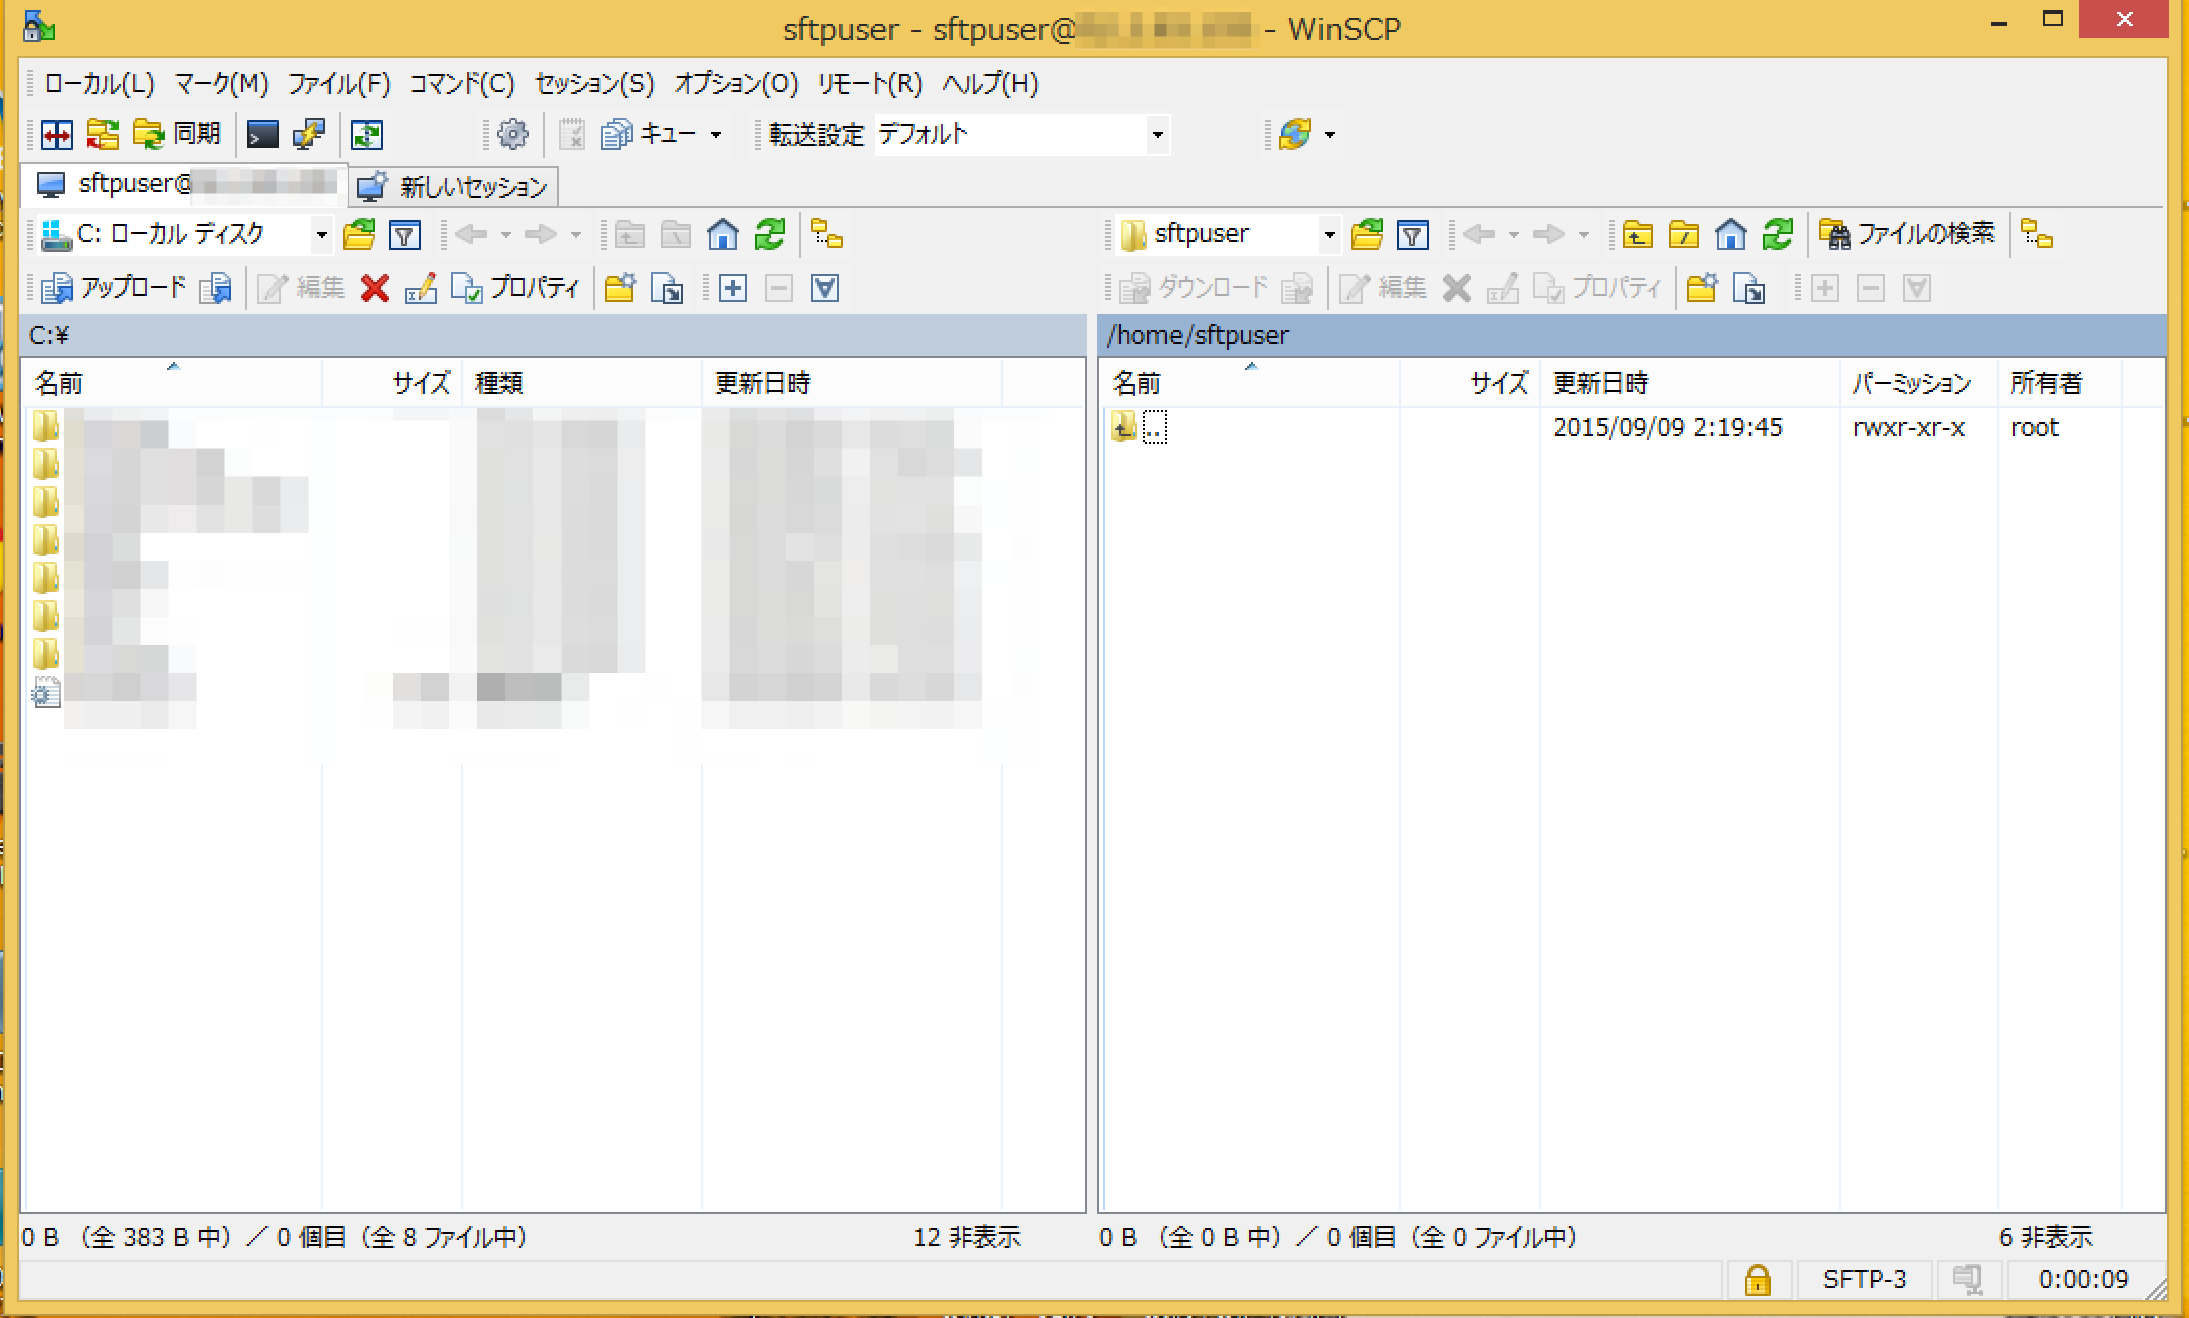 sftp-server-ssh-login_12